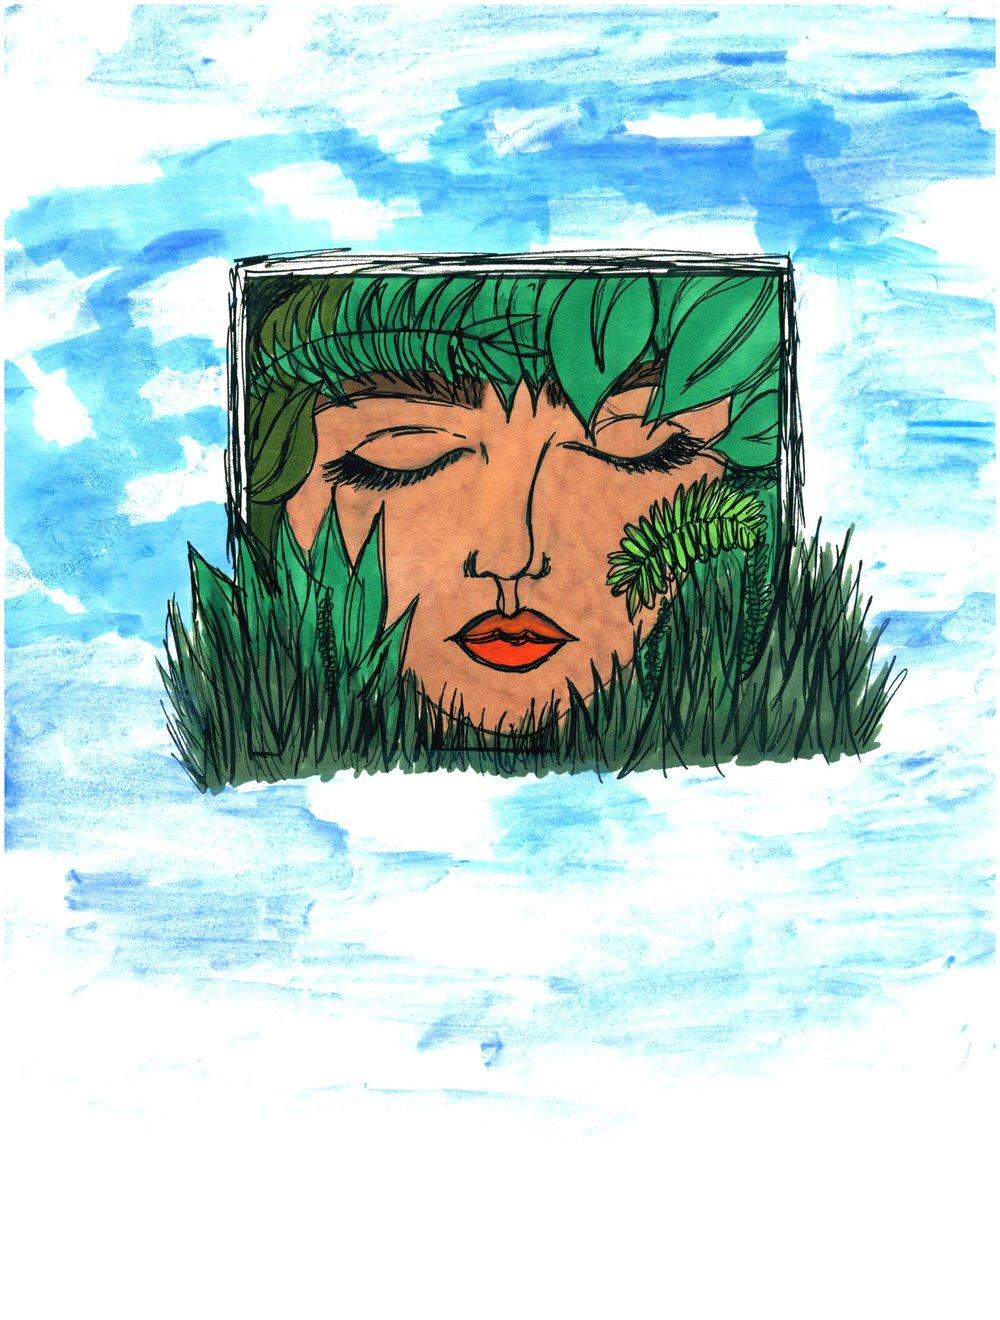 Illustration by Amil Barlow